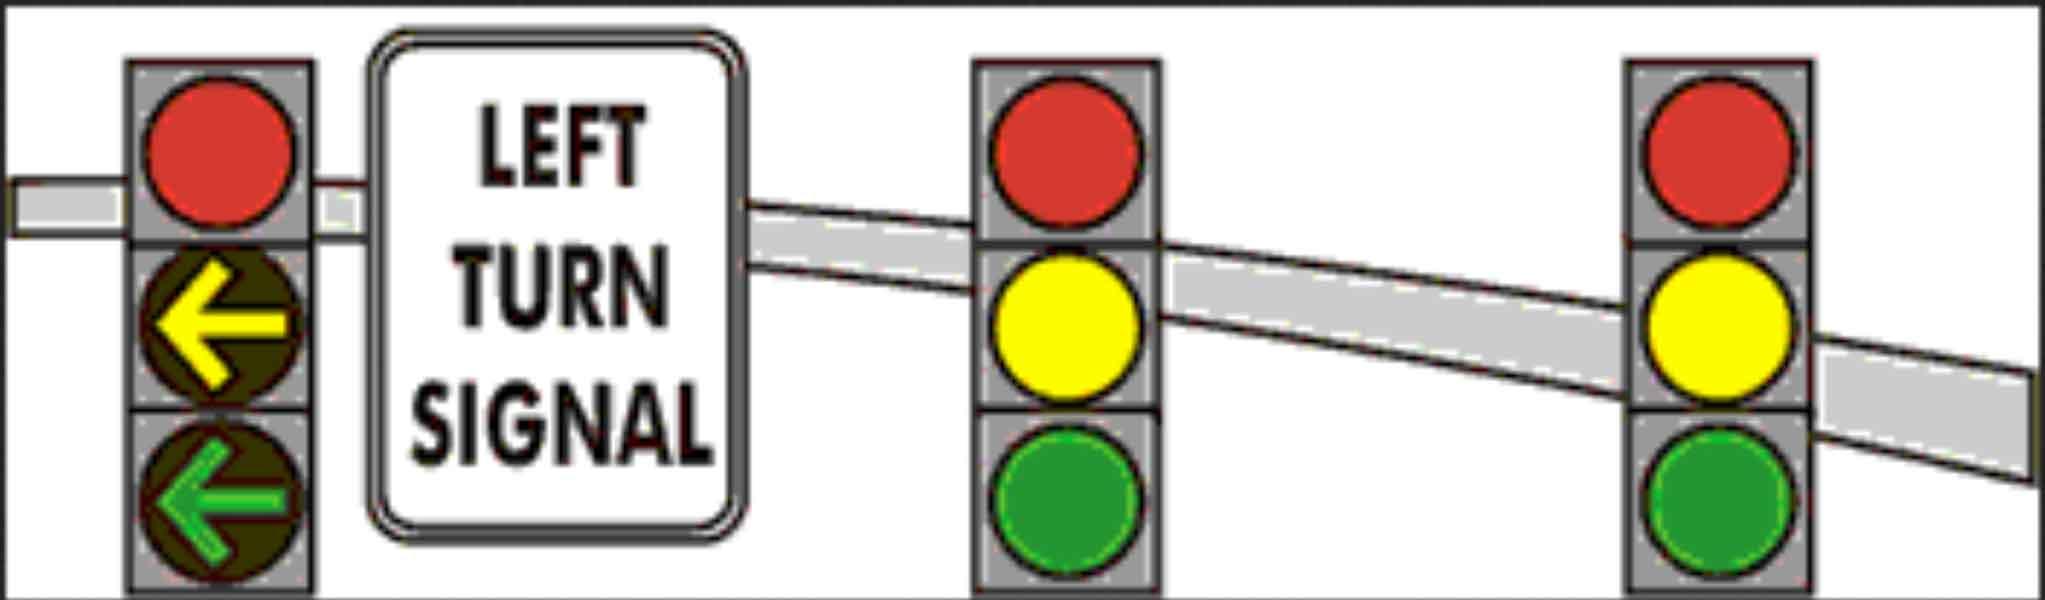 yellow arrow traffic light - photo #36